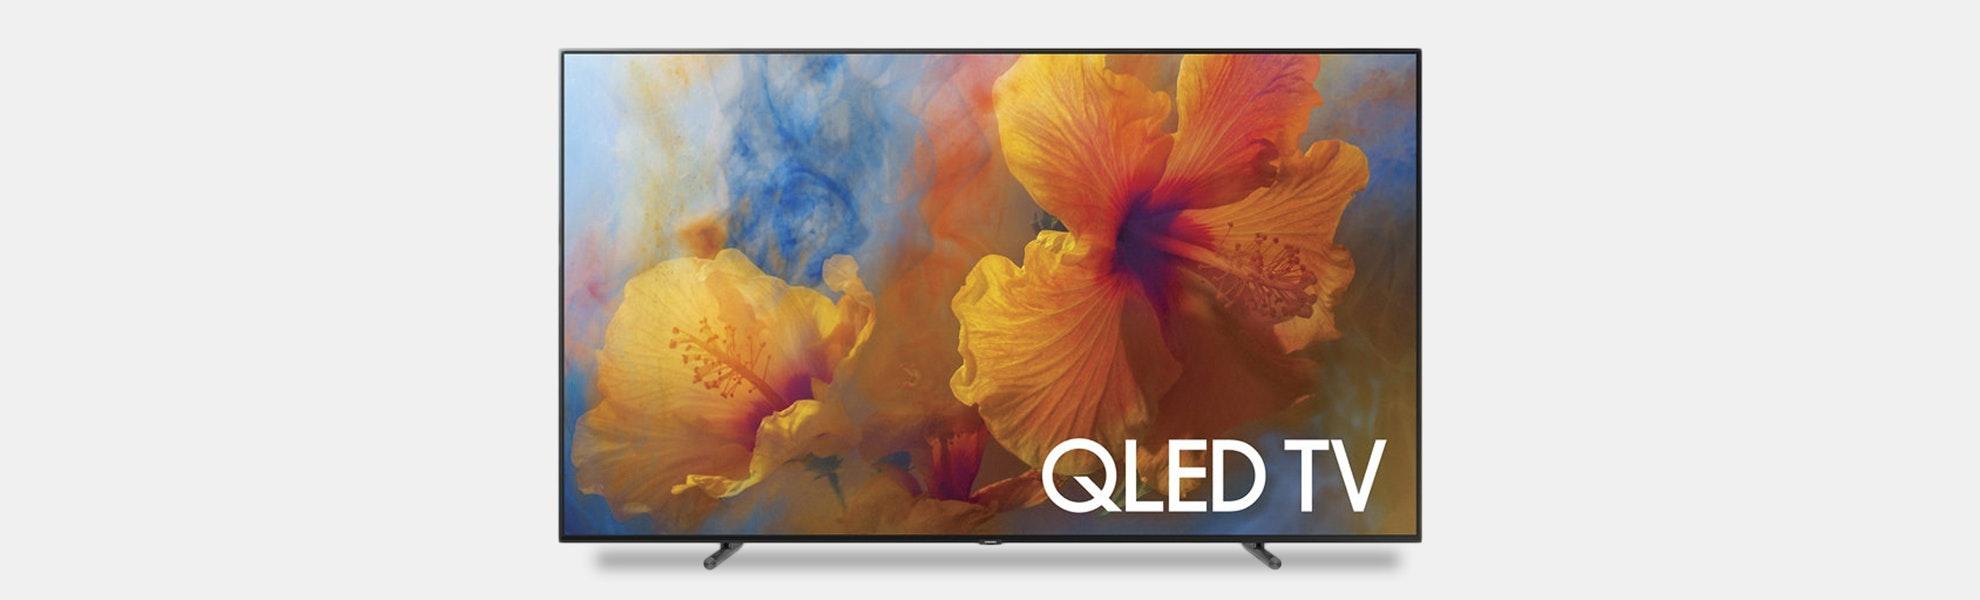 "Samsung 65/75"" Q9F QLED Smart 4K UHD TV"